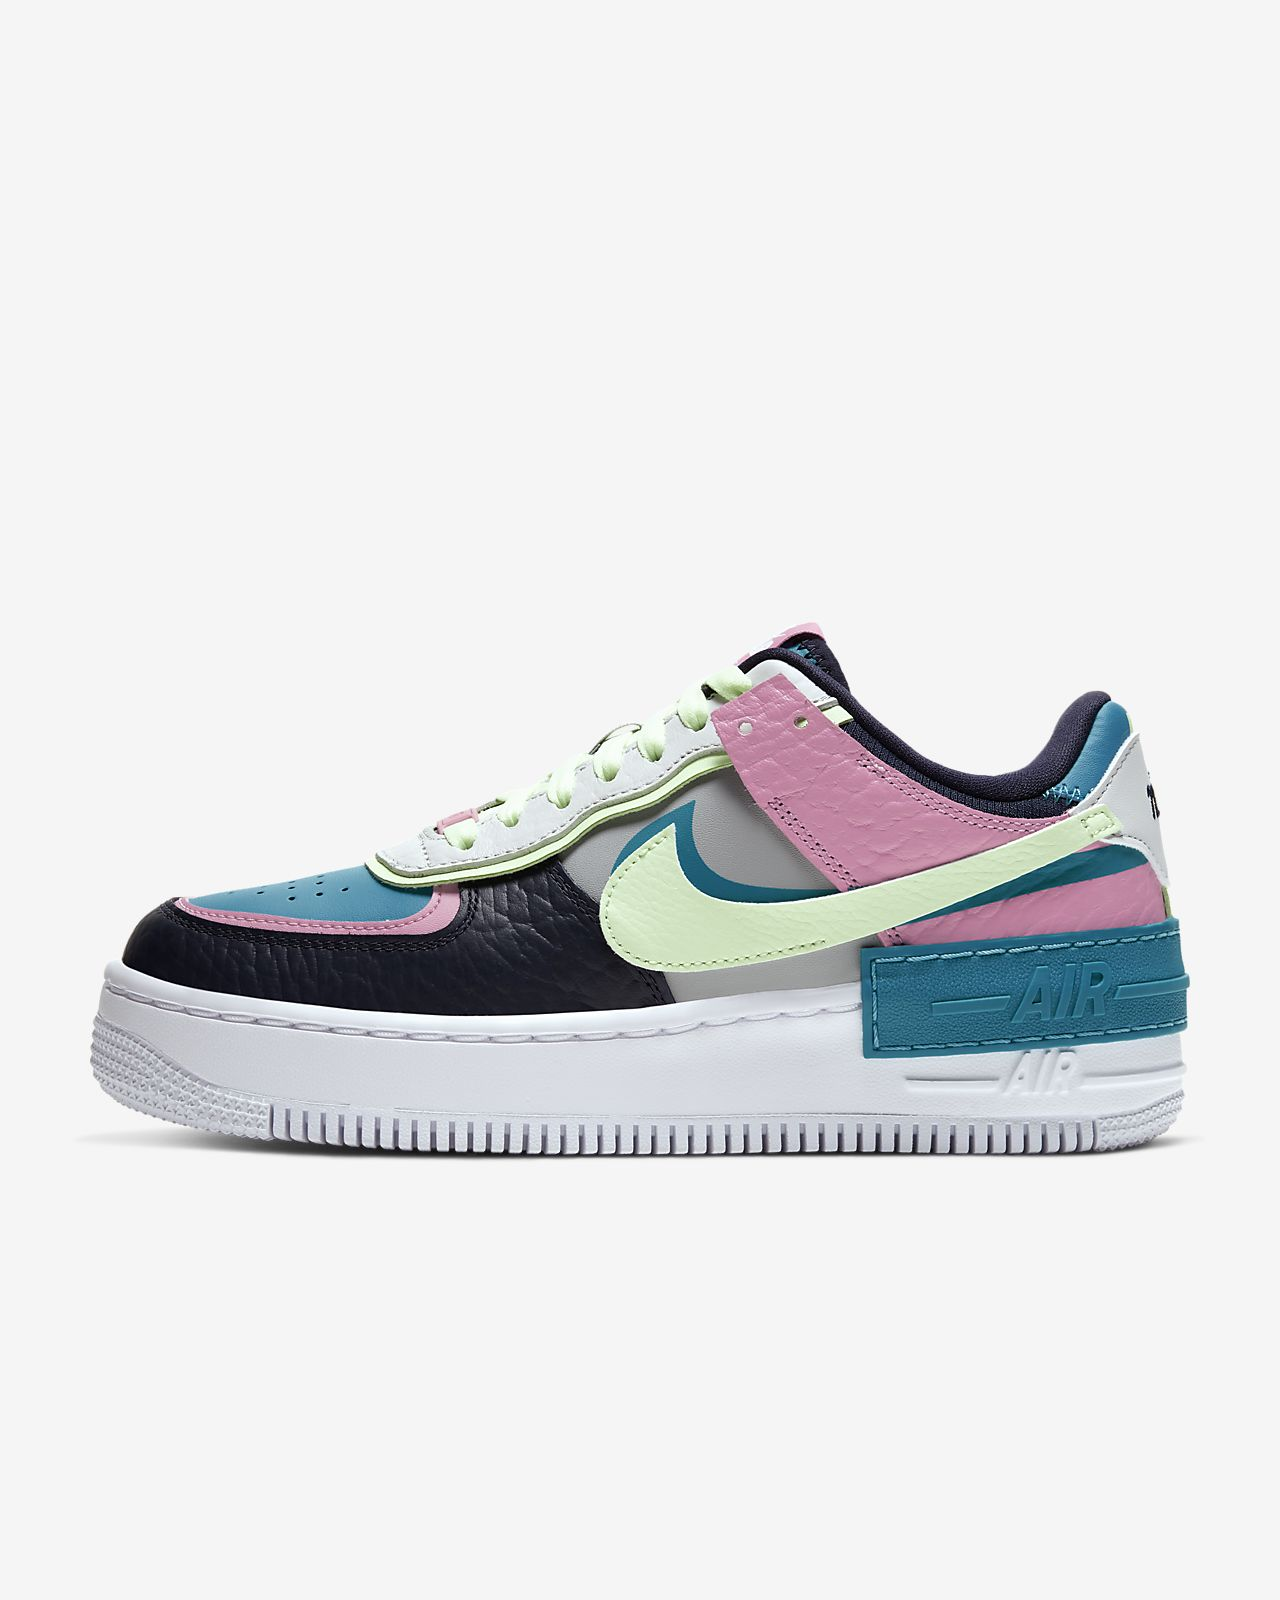 Tenis De Basquete Nike Menina Air Force 1 | Sapatilhas Nike